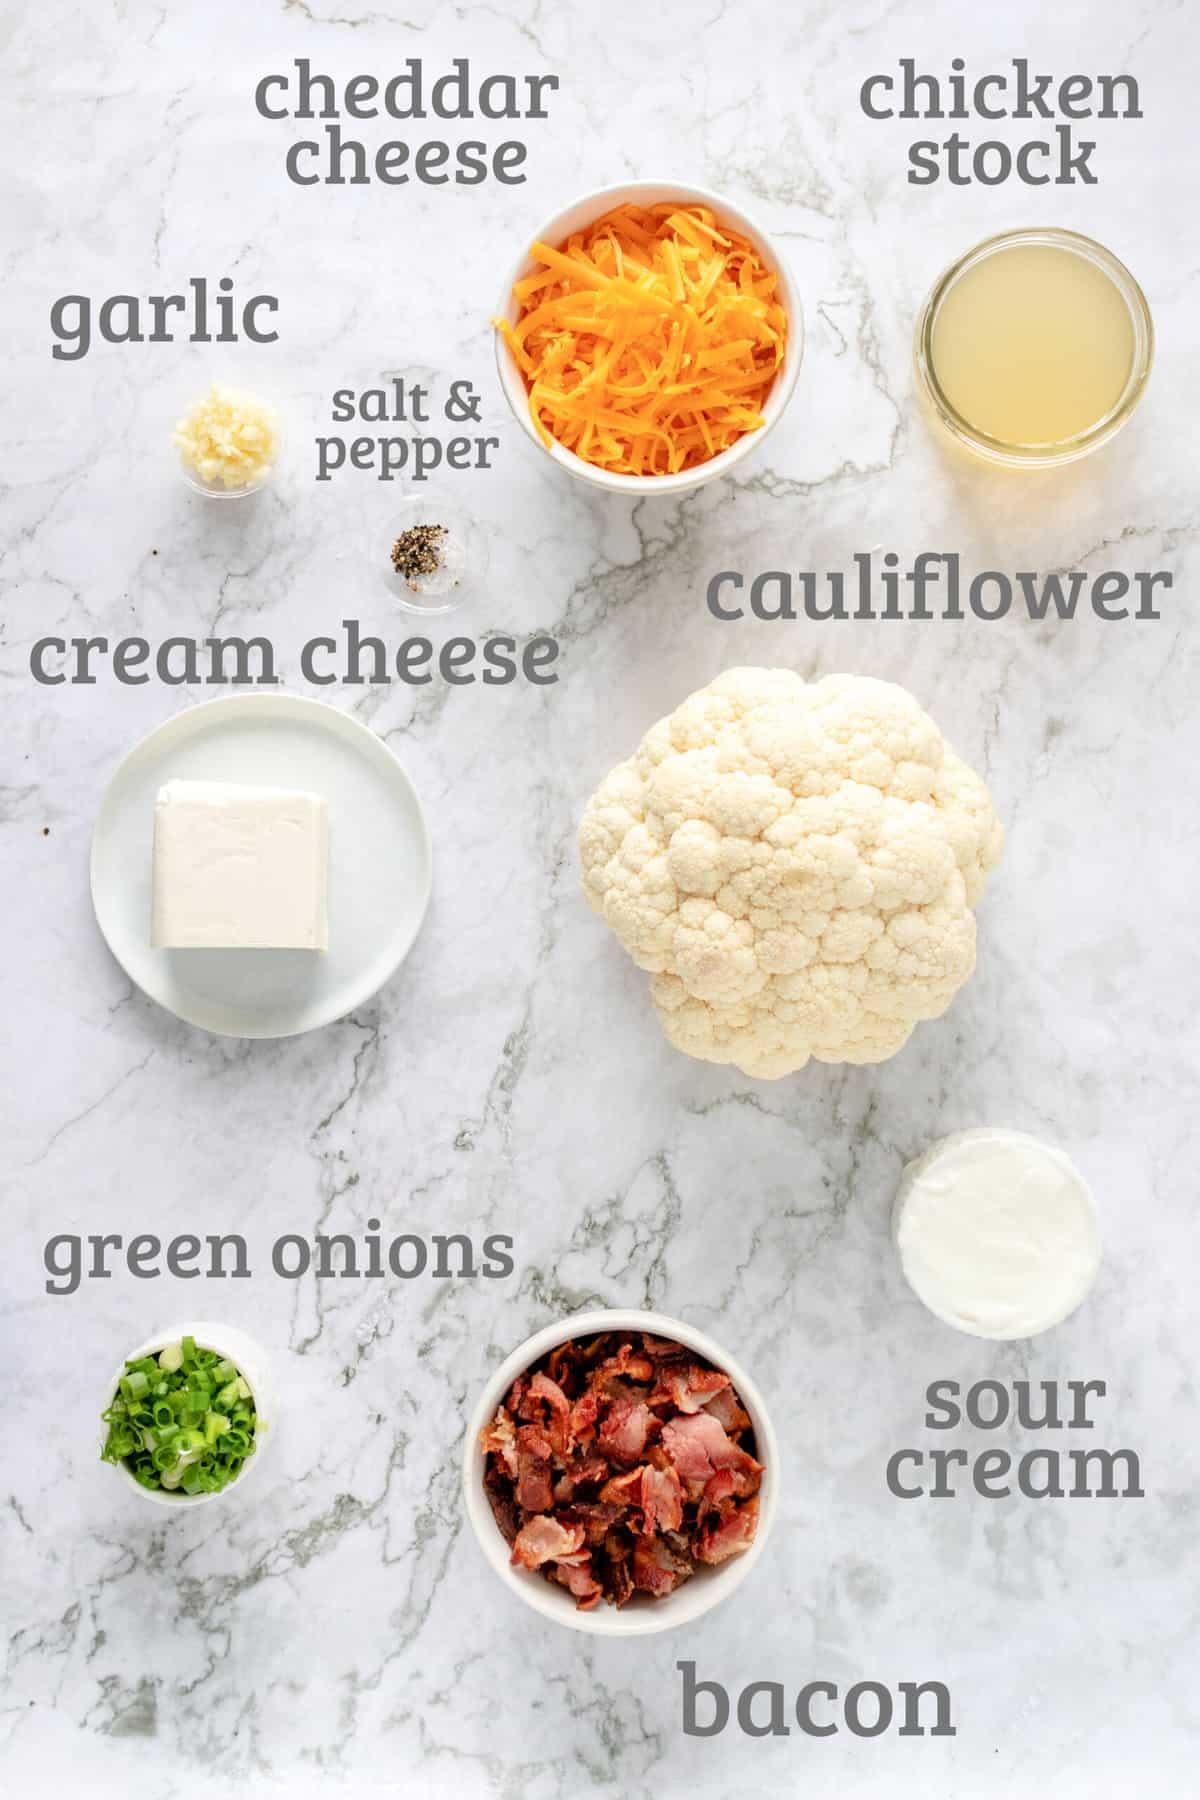 ingredients for loaded cauliflower casserole - cauliflower, bacon, cheese, onions, sour cream